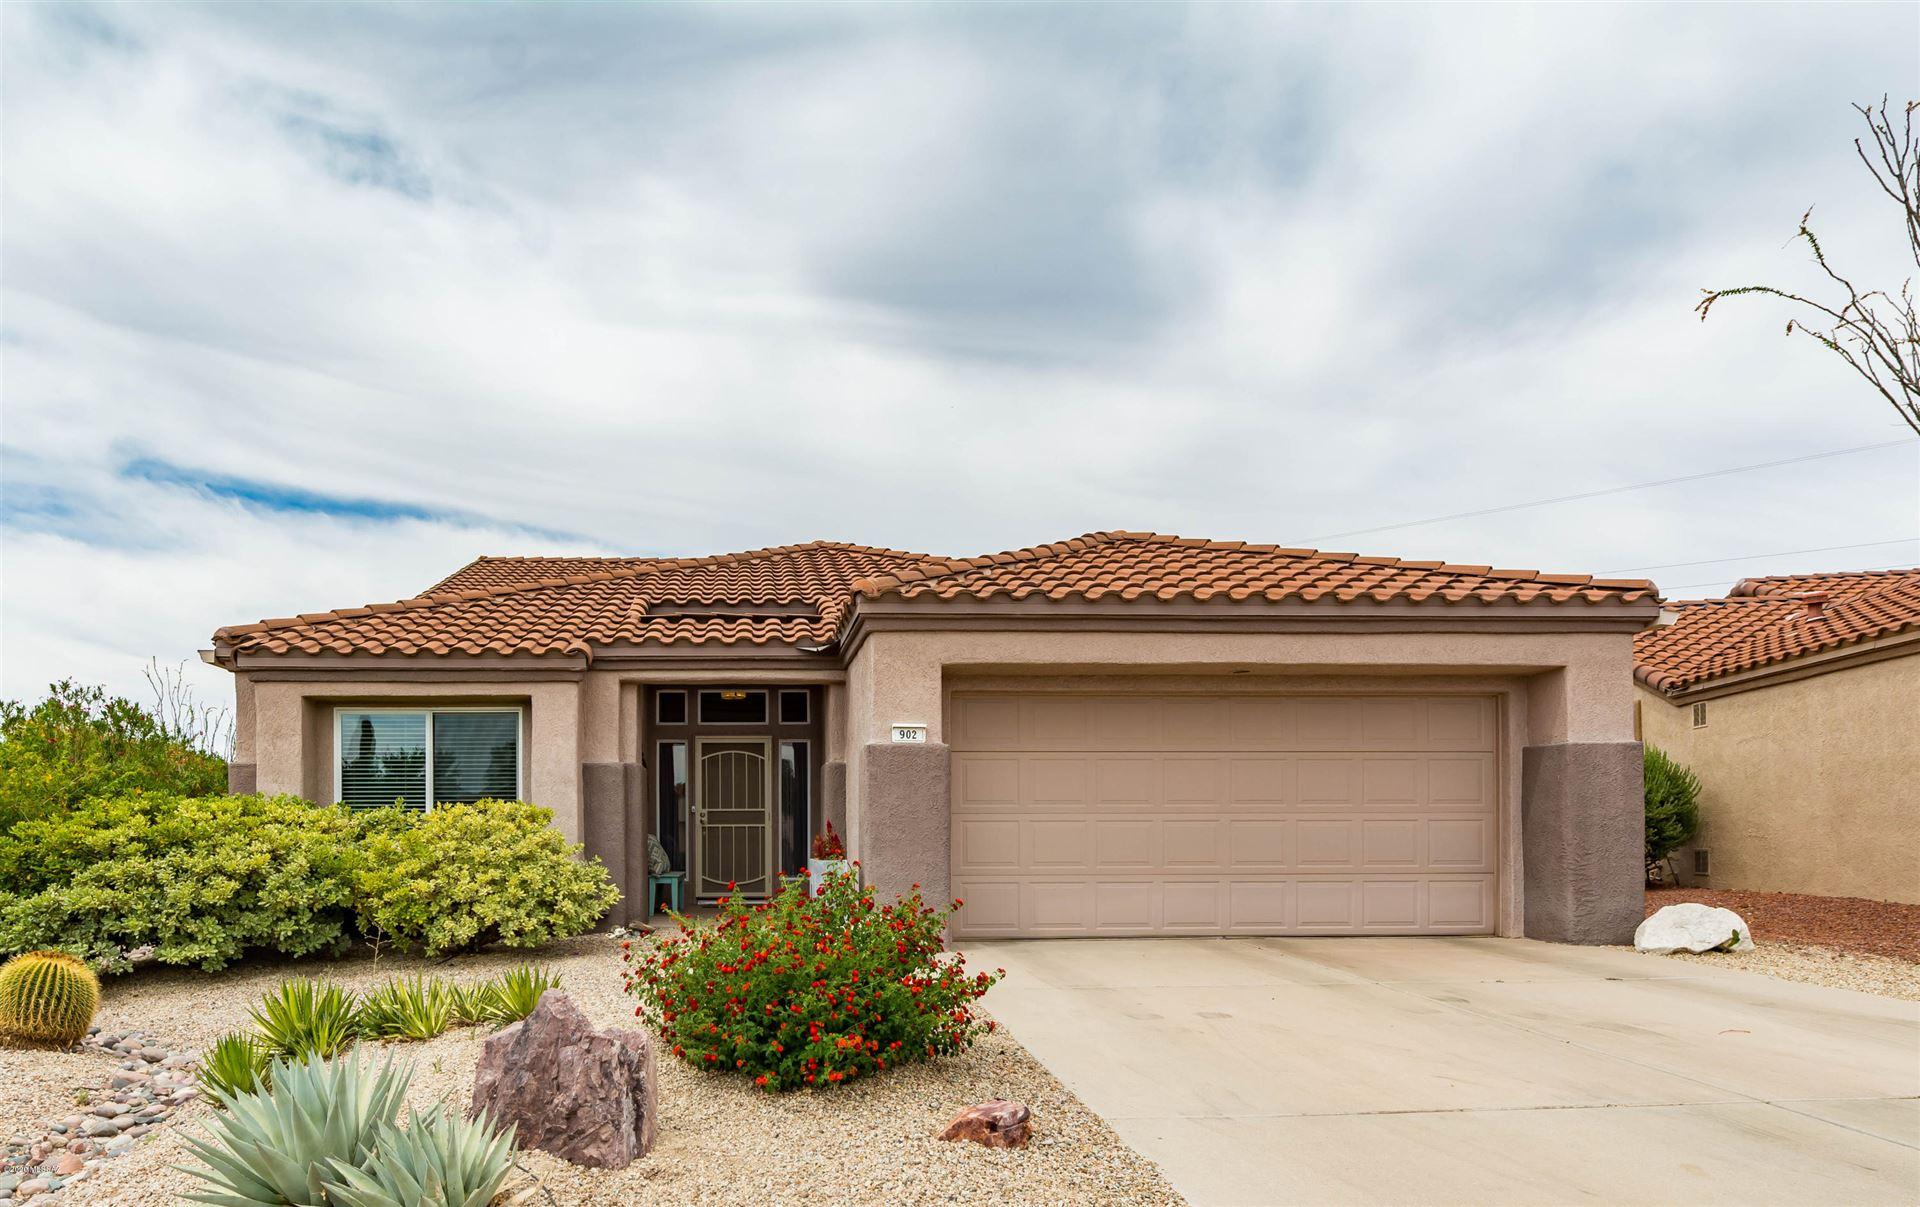 902 E Claridge Place, Oro Valley, AZ 85755 - MLS#: 22016094